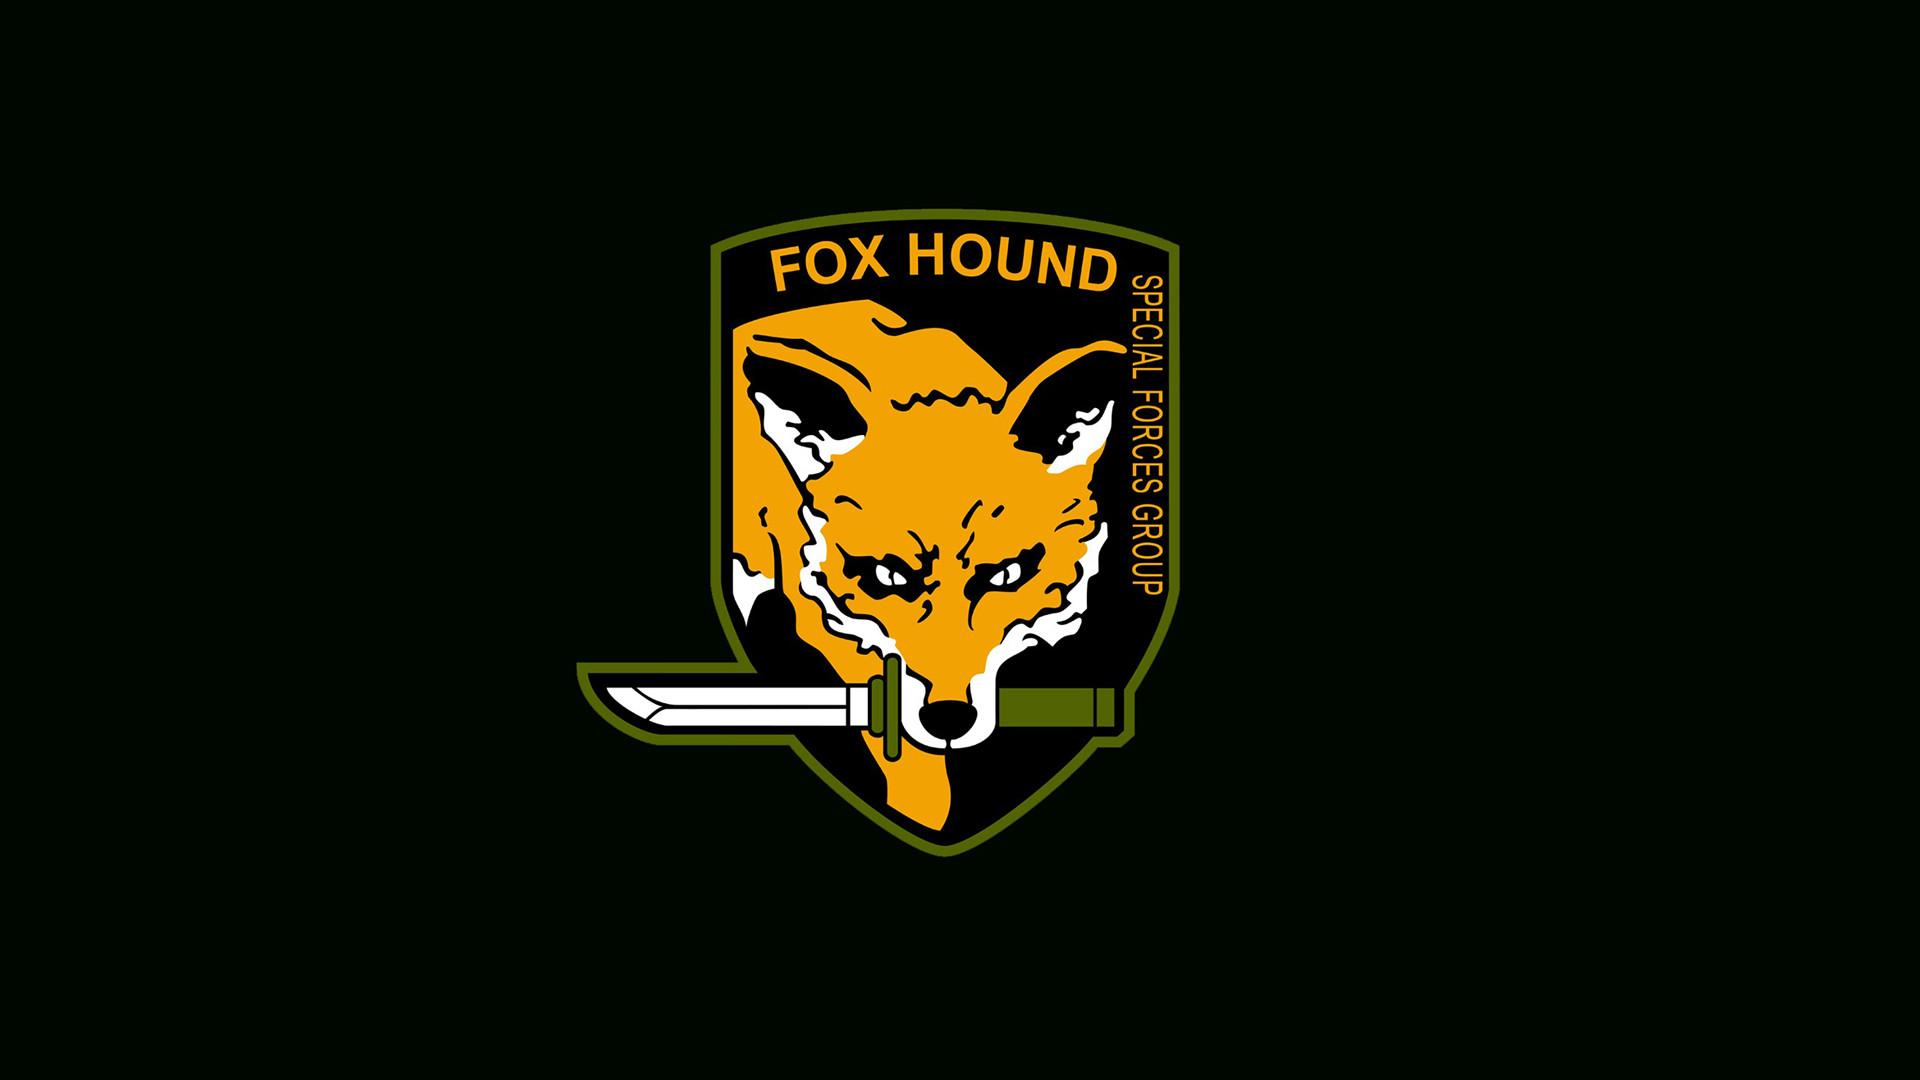 Metal Gear Solid FOX HOUND – Wallpaper